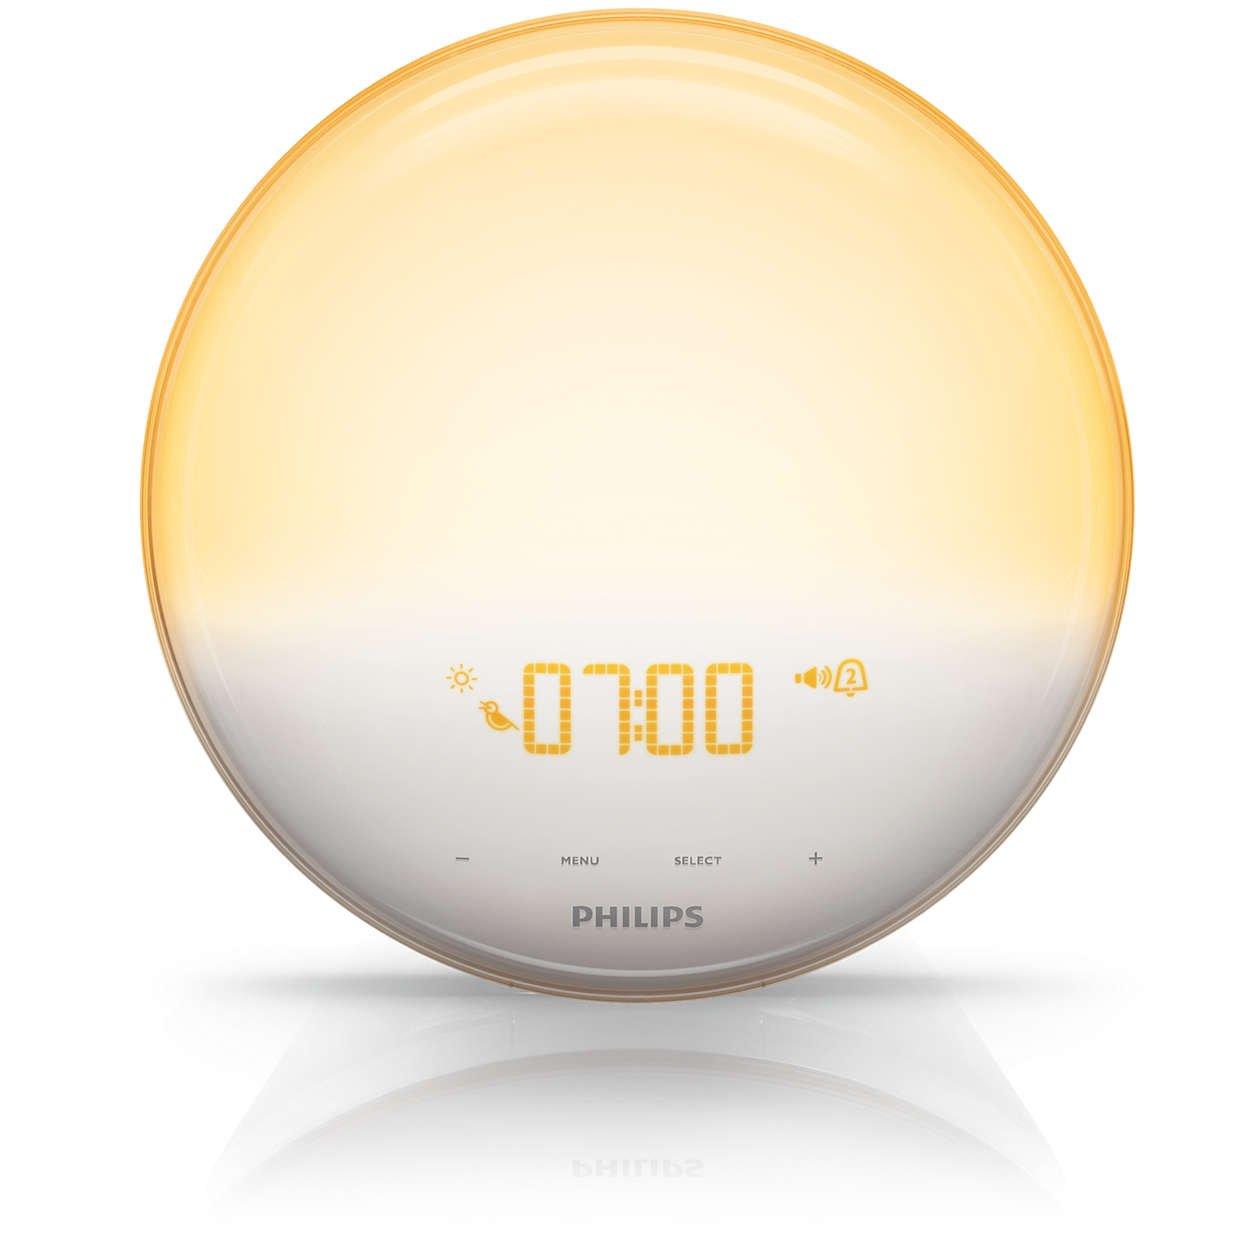 philips-wake-up-light-alarm-clock-hf3531-01